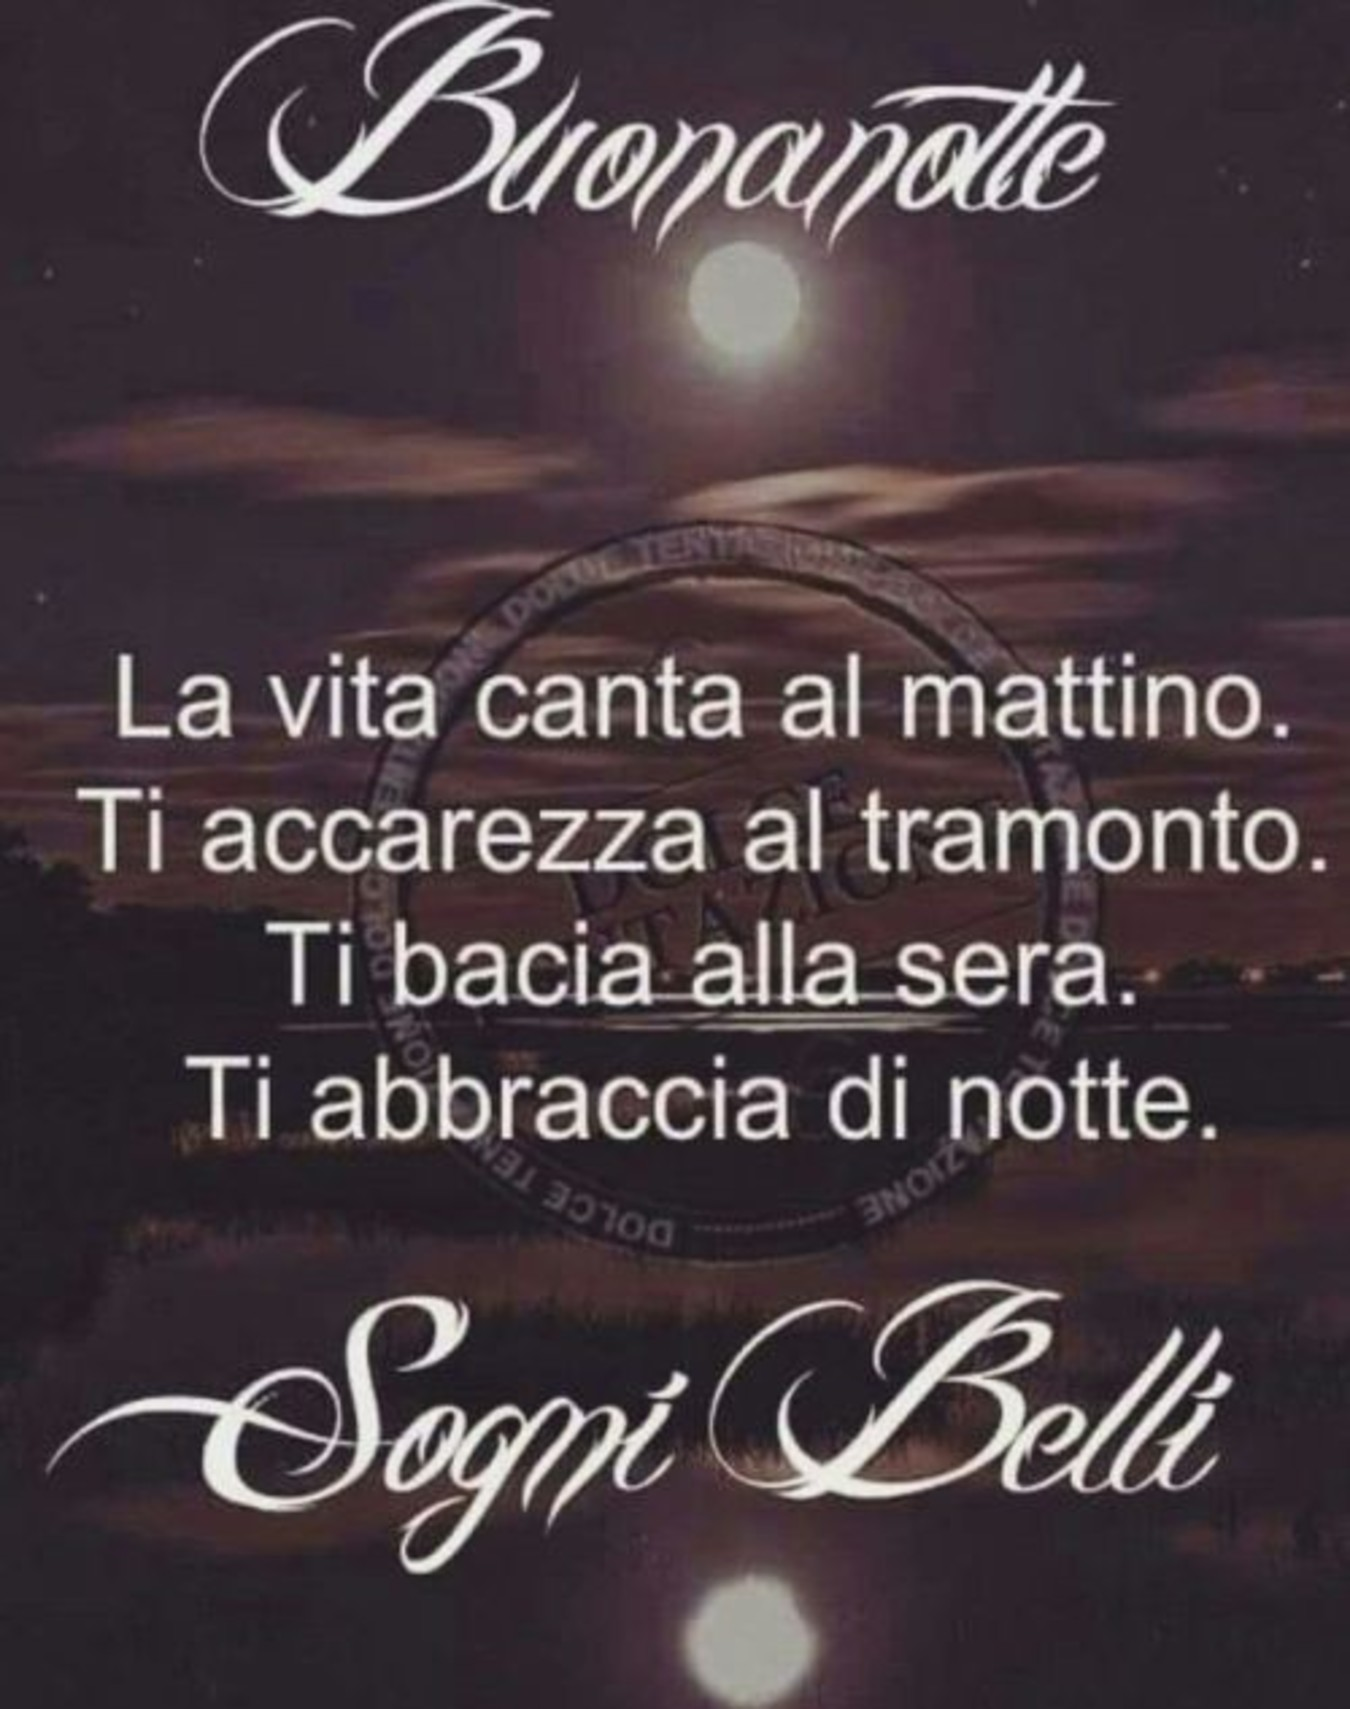 Immagini Buonanotte Belle Gratis Per Whatsapp Immaginifacebook It